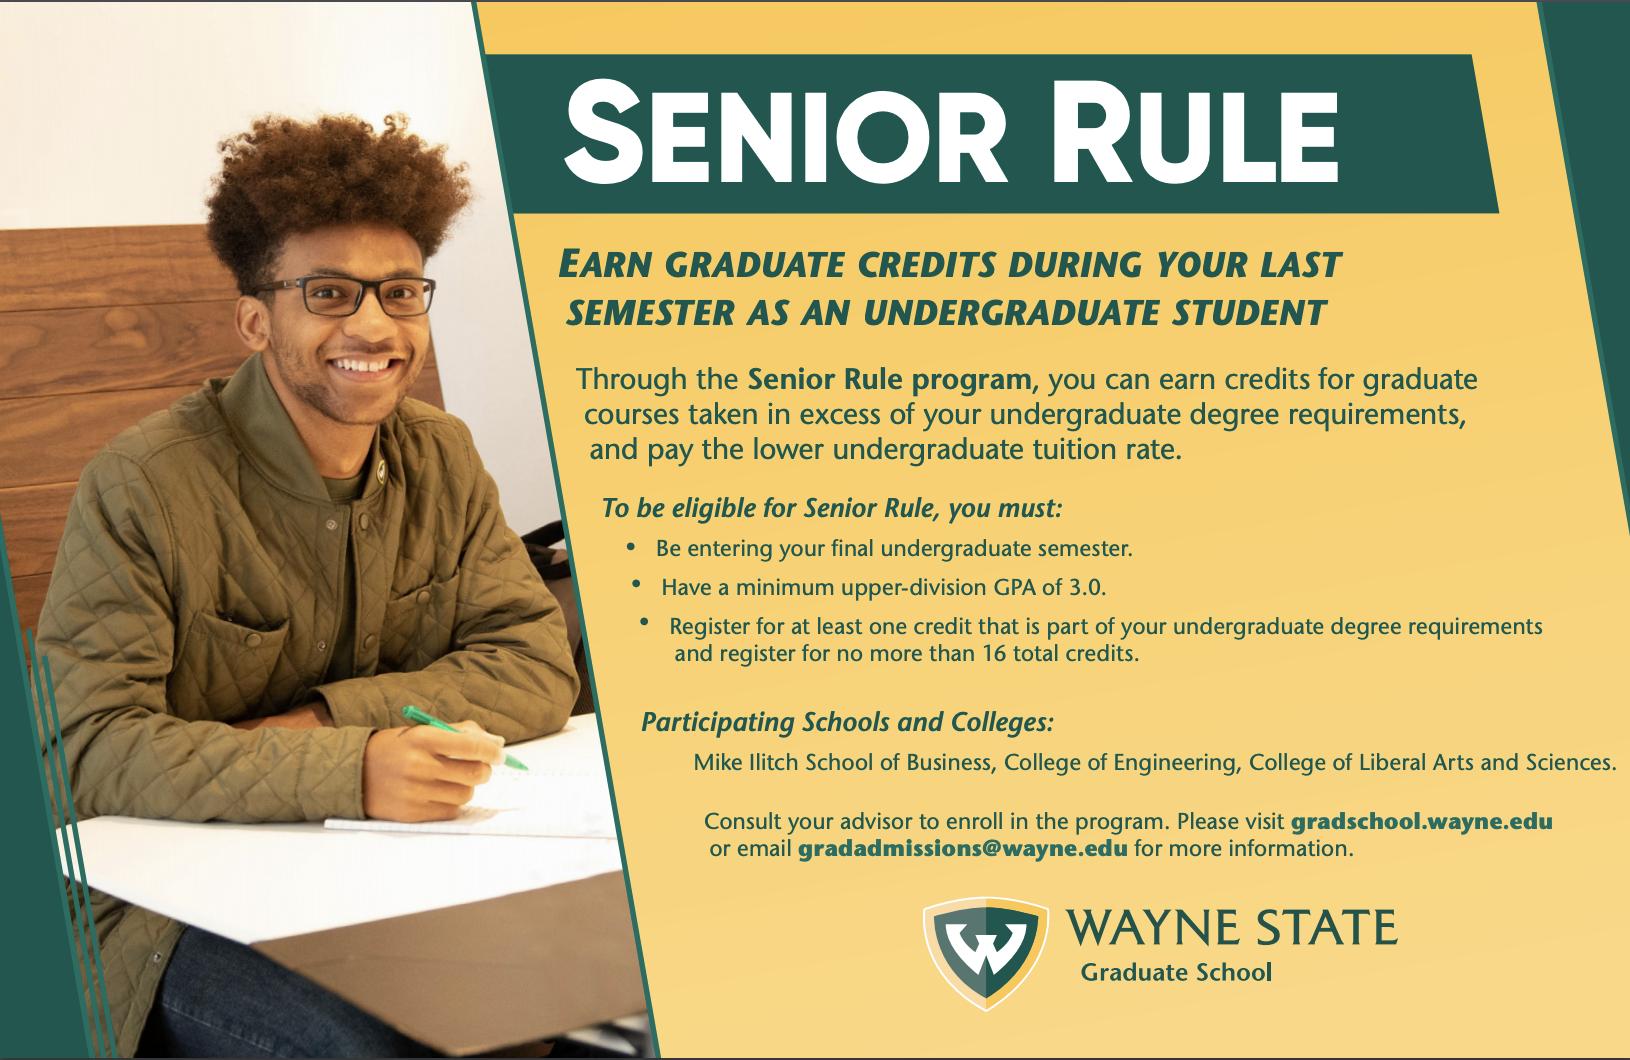 Accelerated Programs Agrade Graduate School Wayne State University